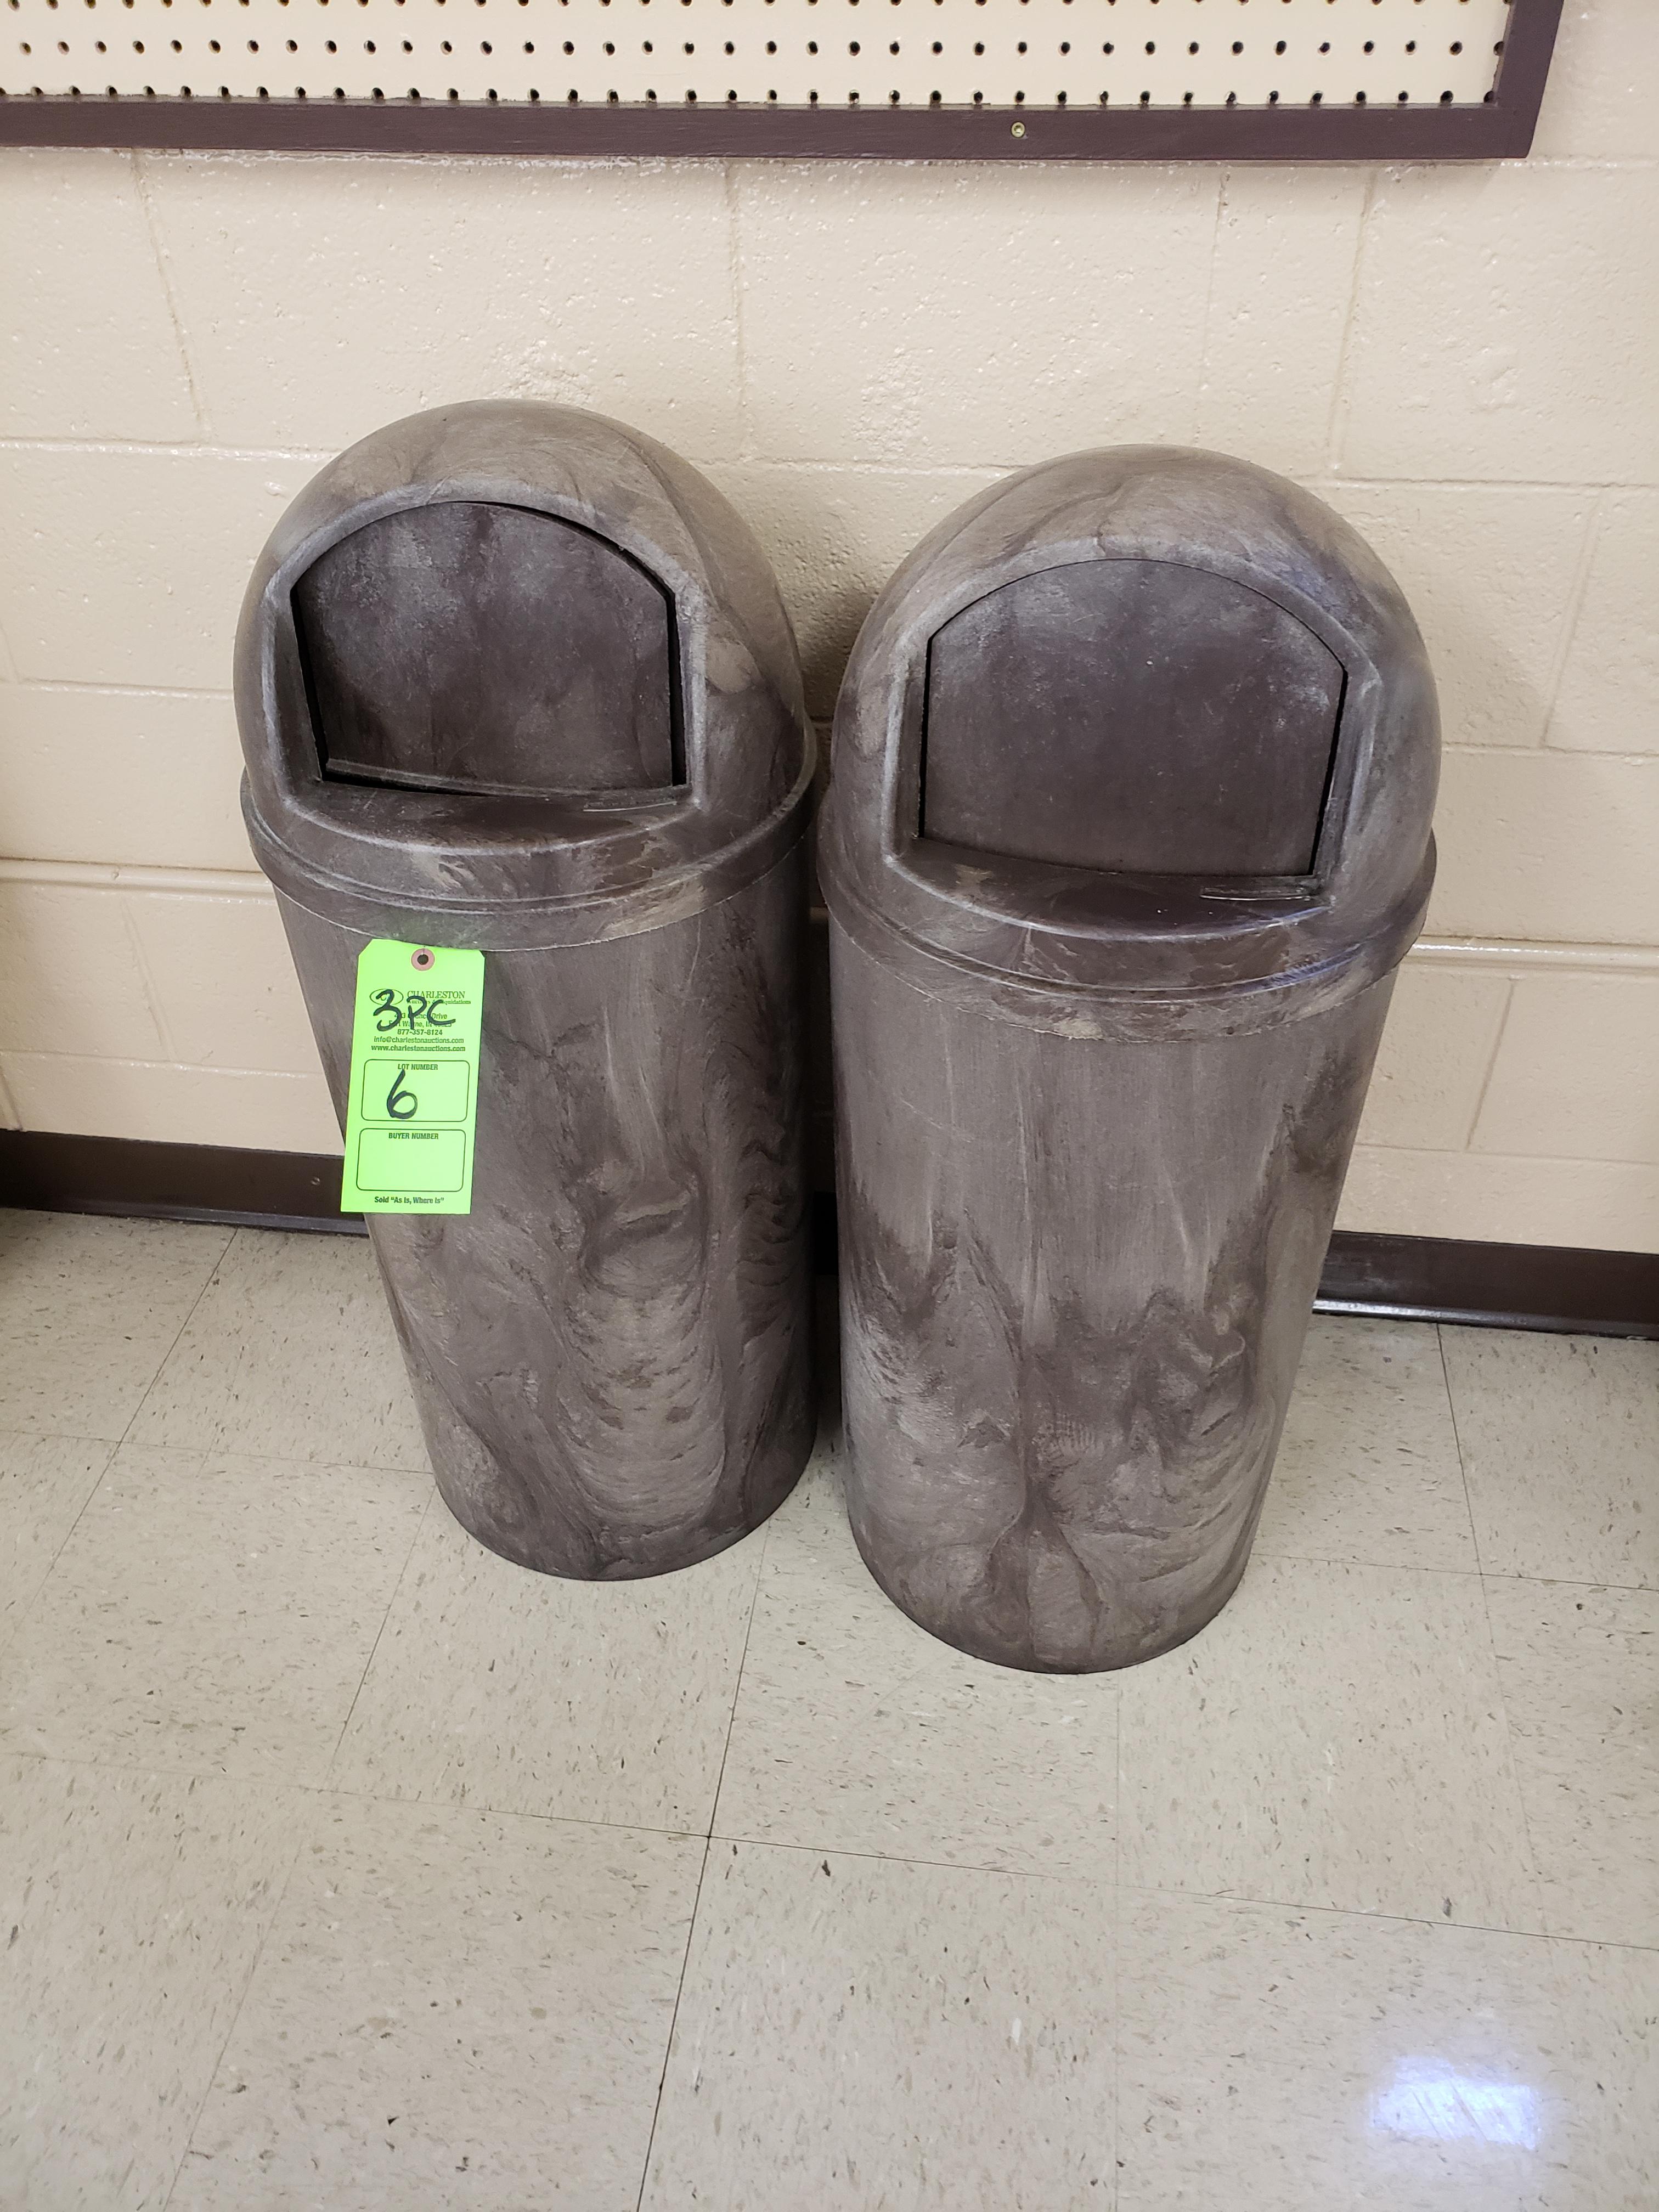 Lot 6 - (3) RUBERMAID TRASH CANS